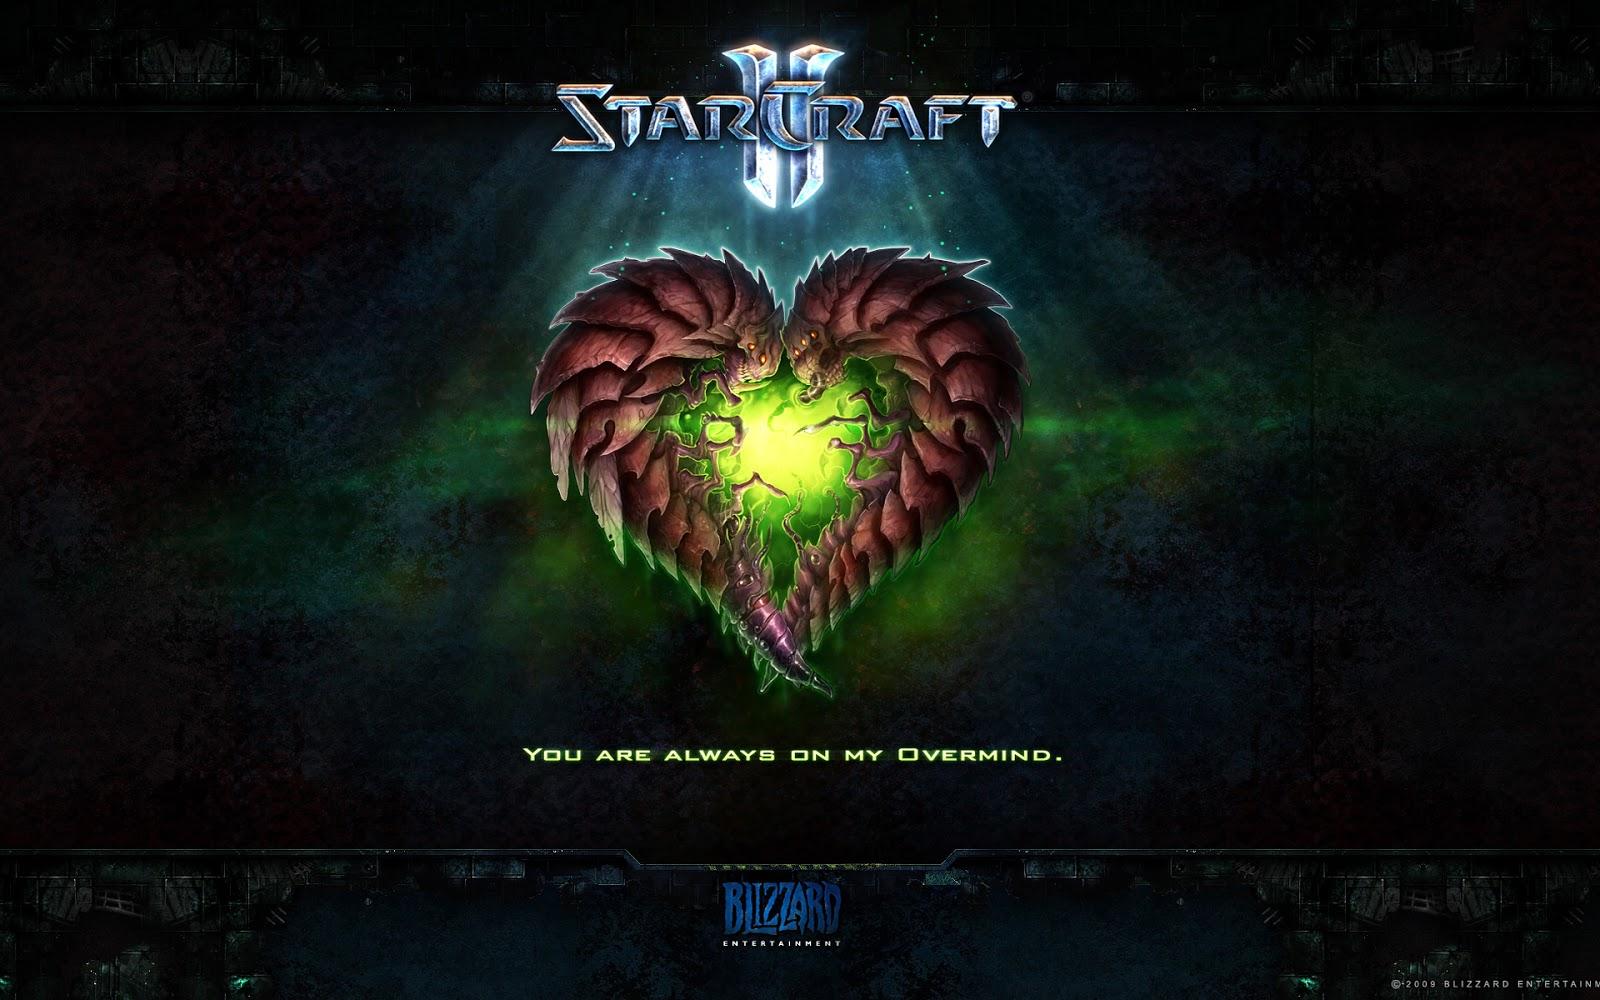 computerspiele kostenlos downloaden